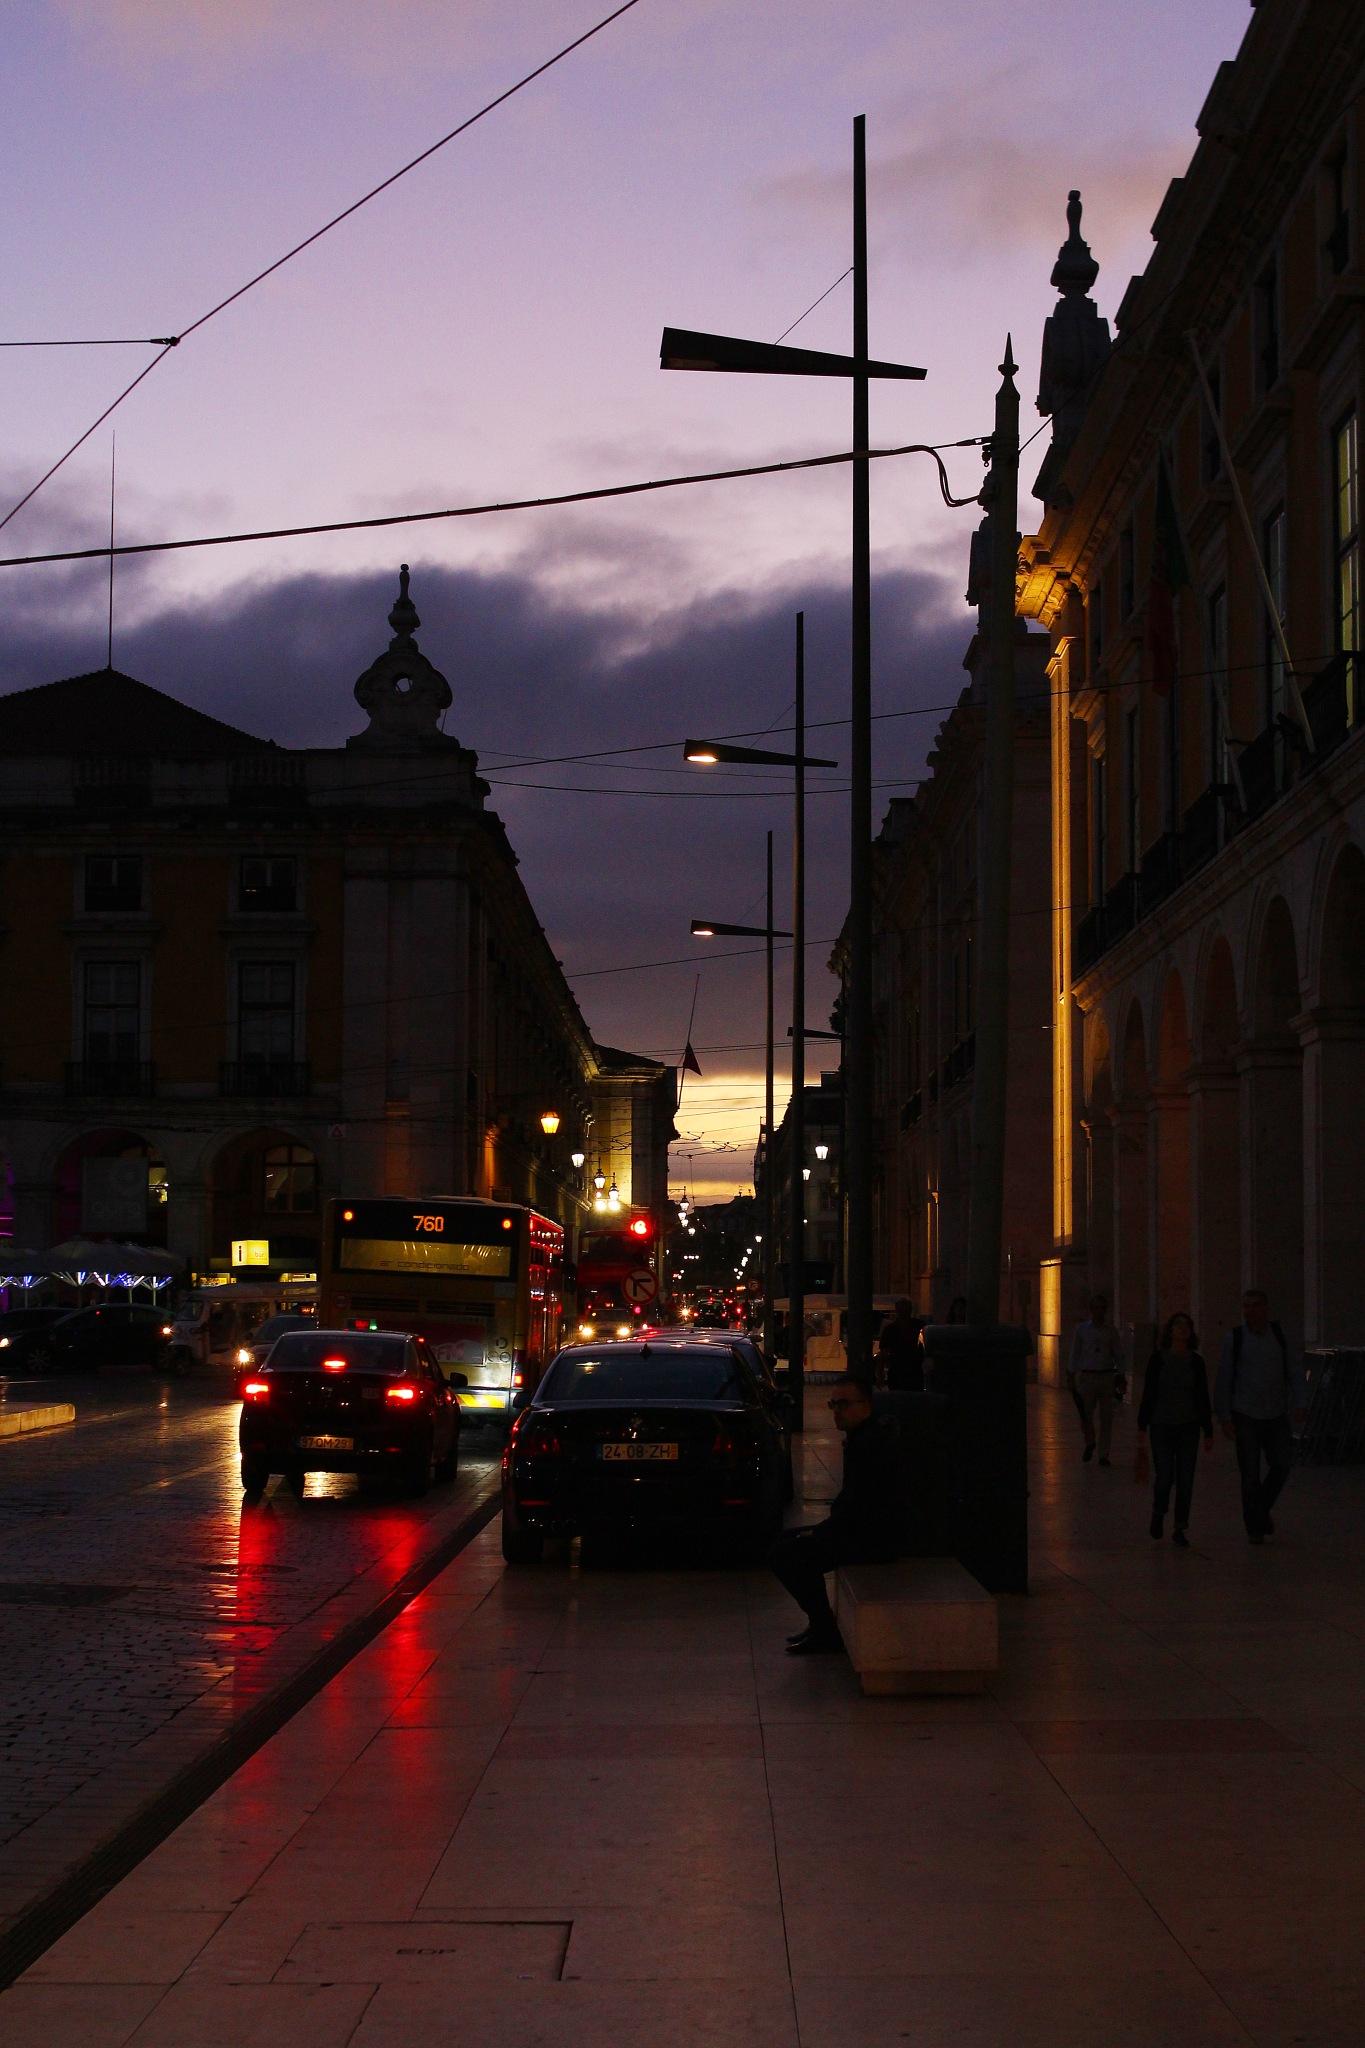 Magic hour in Lisbon  by carlosmsantos